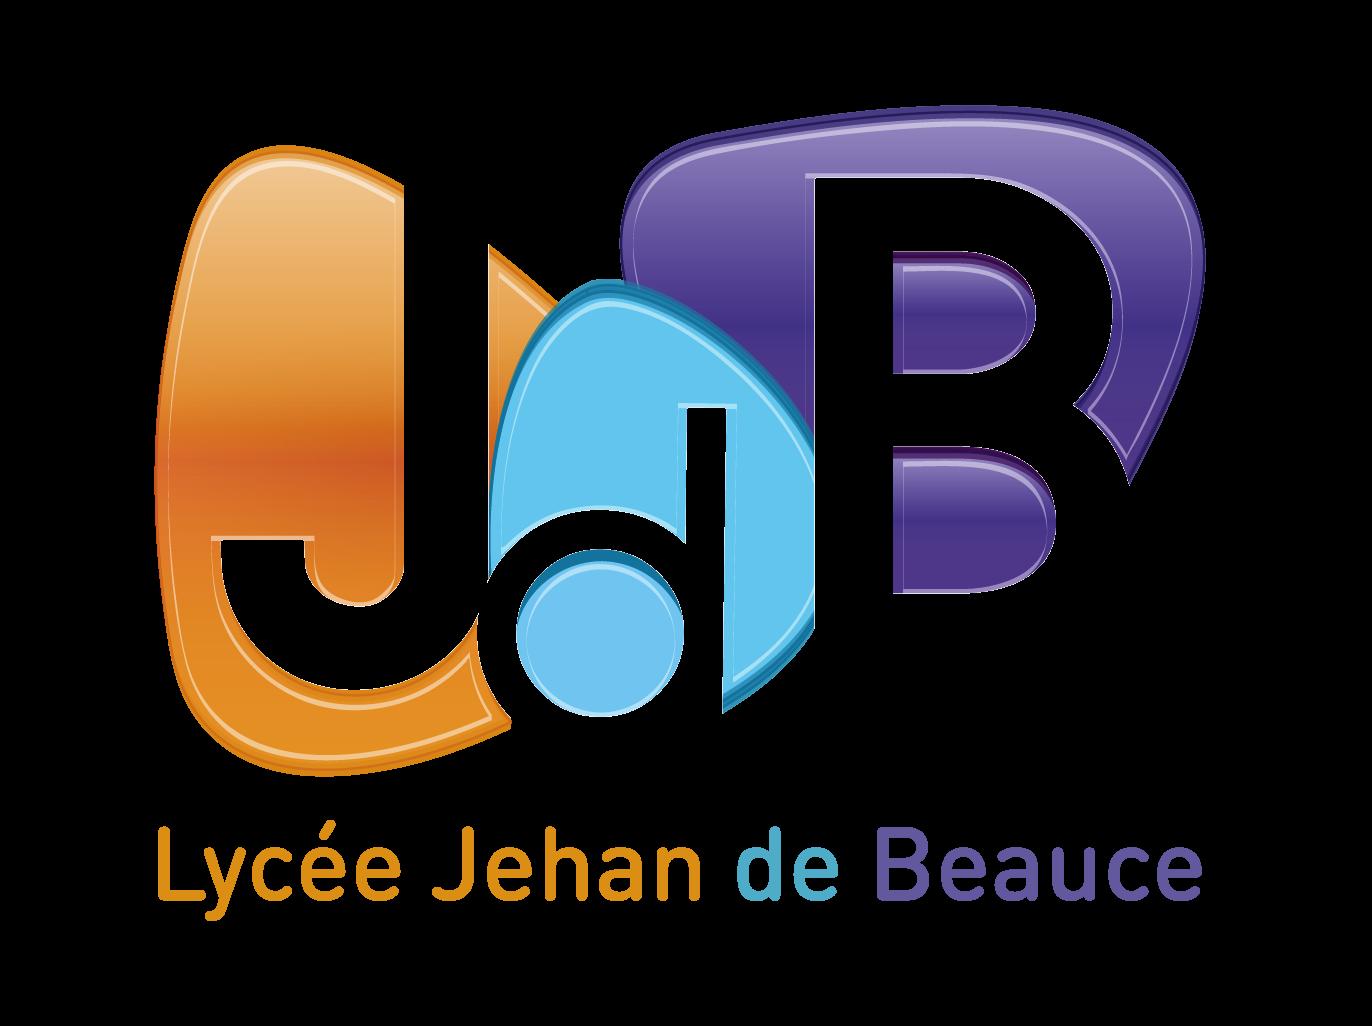 Lycée Jehan de Beauce